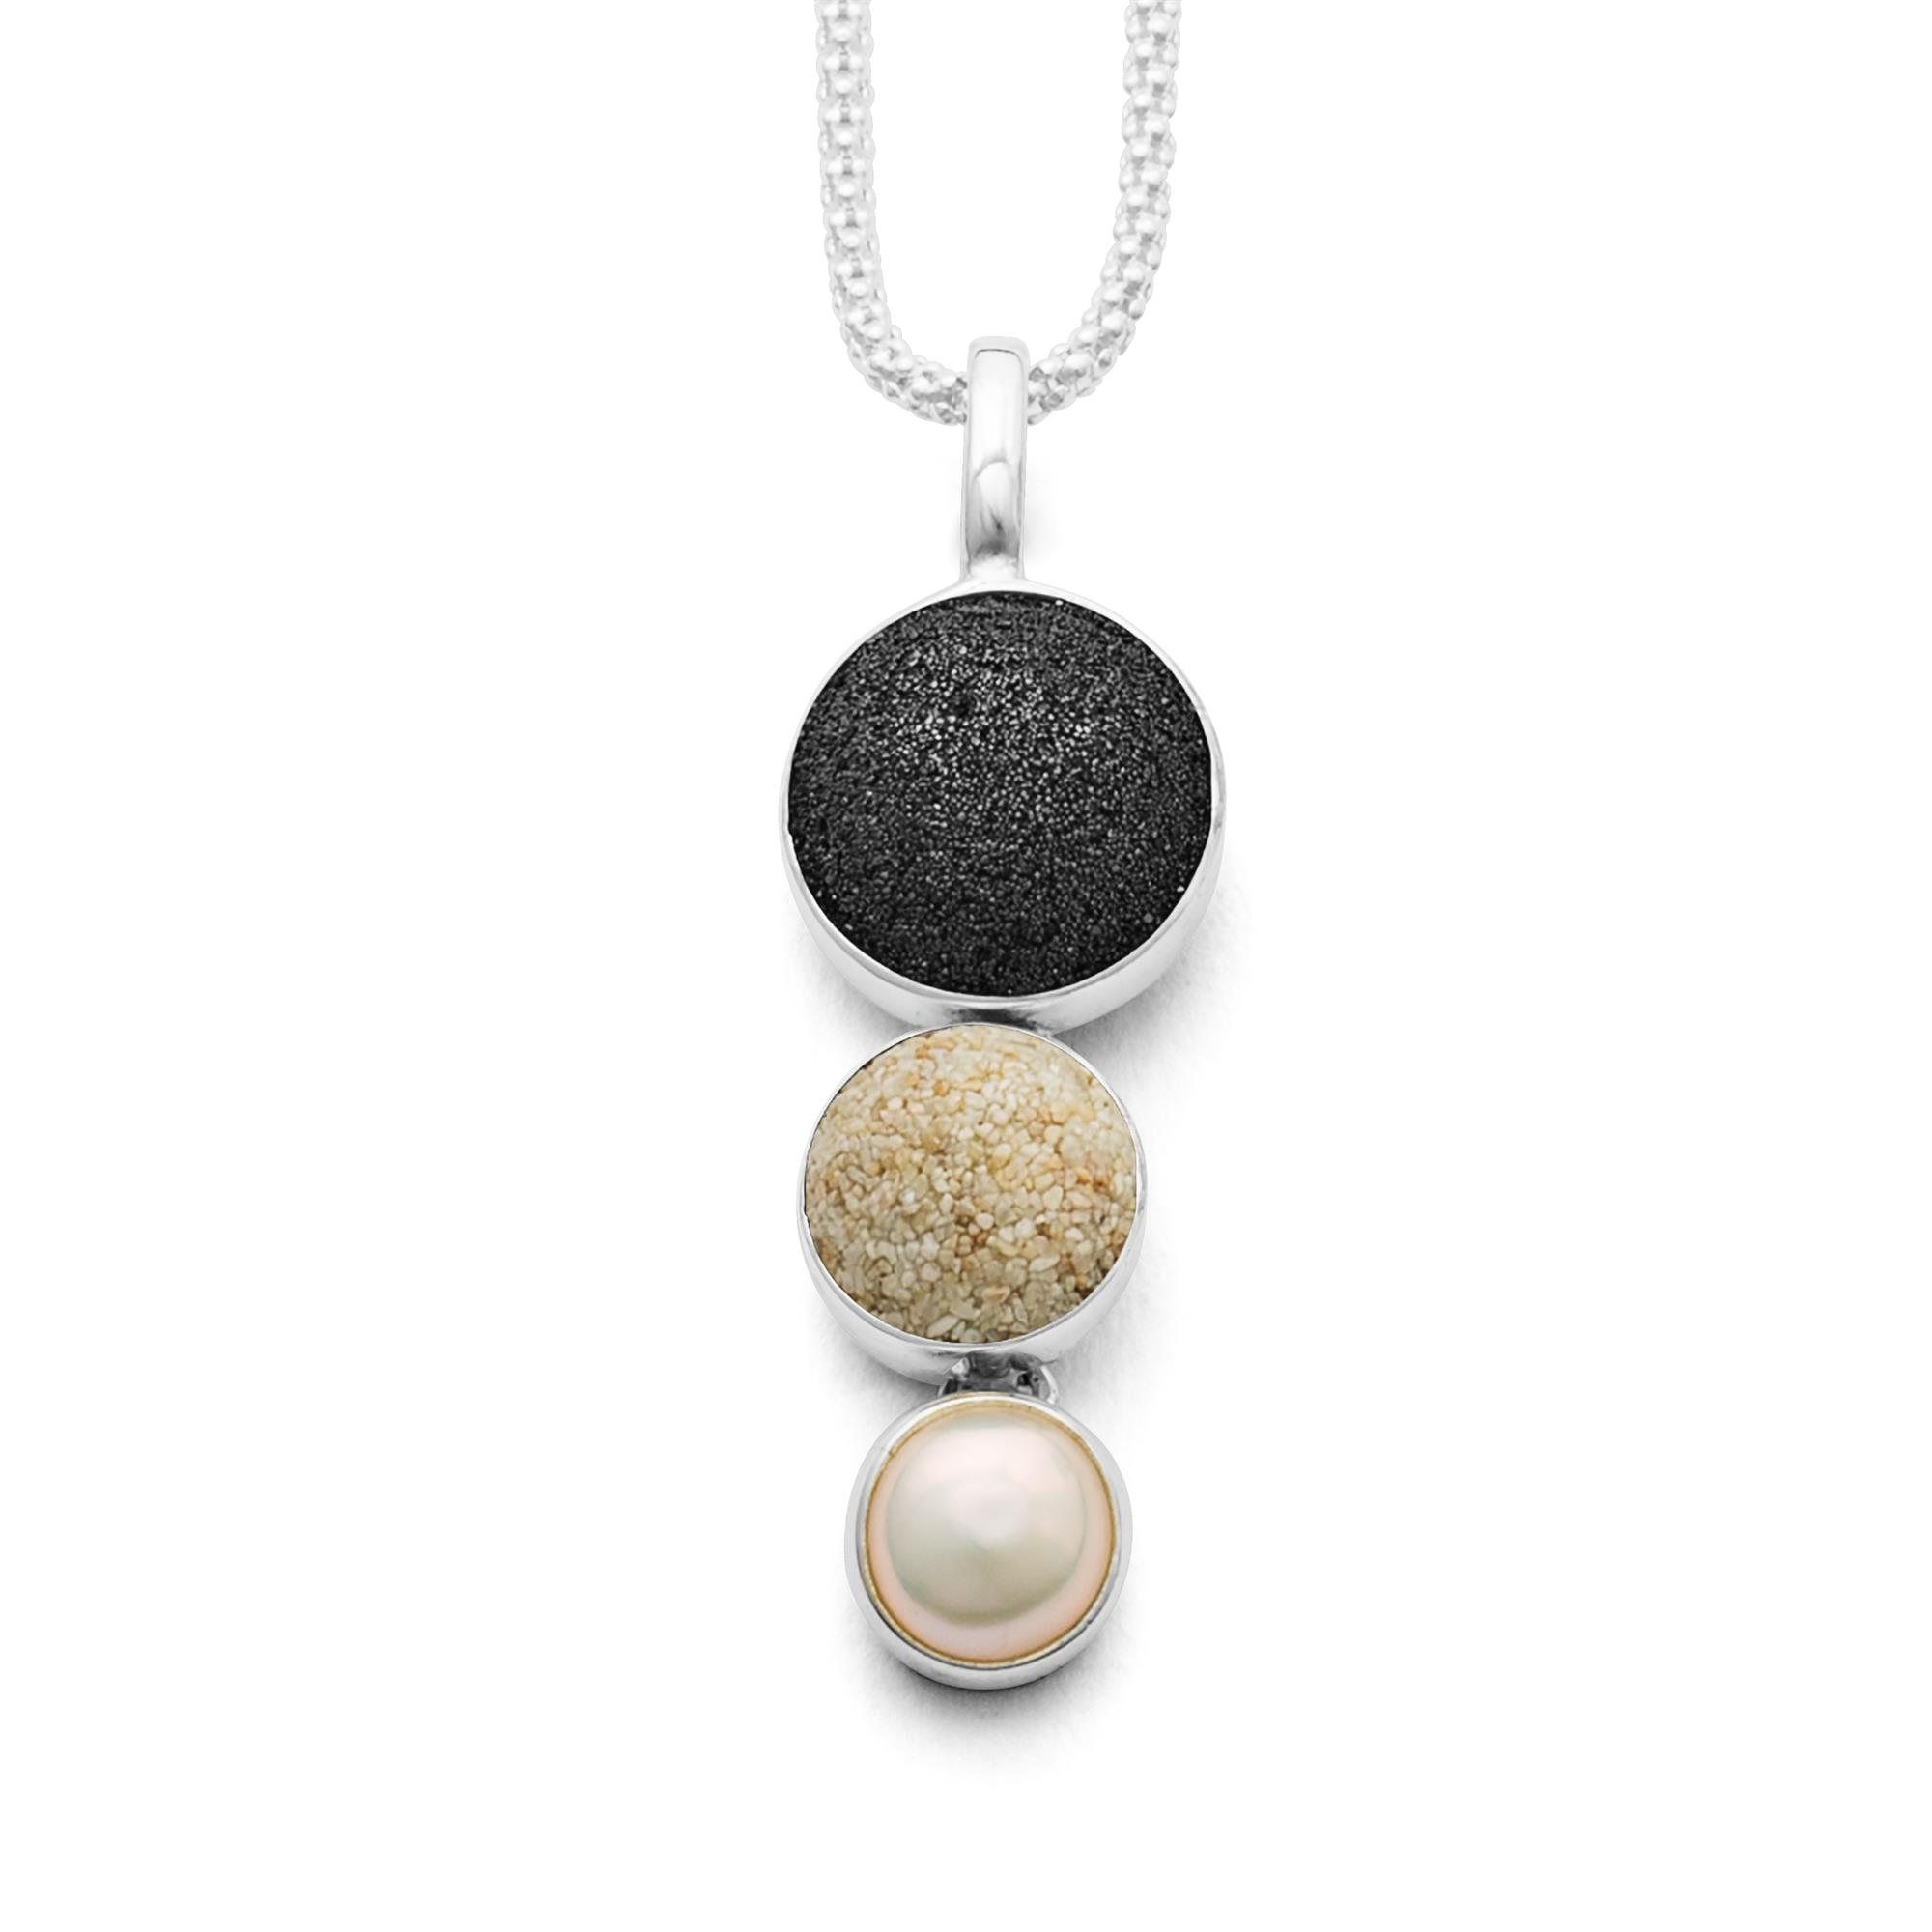 925 Silber mit Vulkan- u. Strandsand